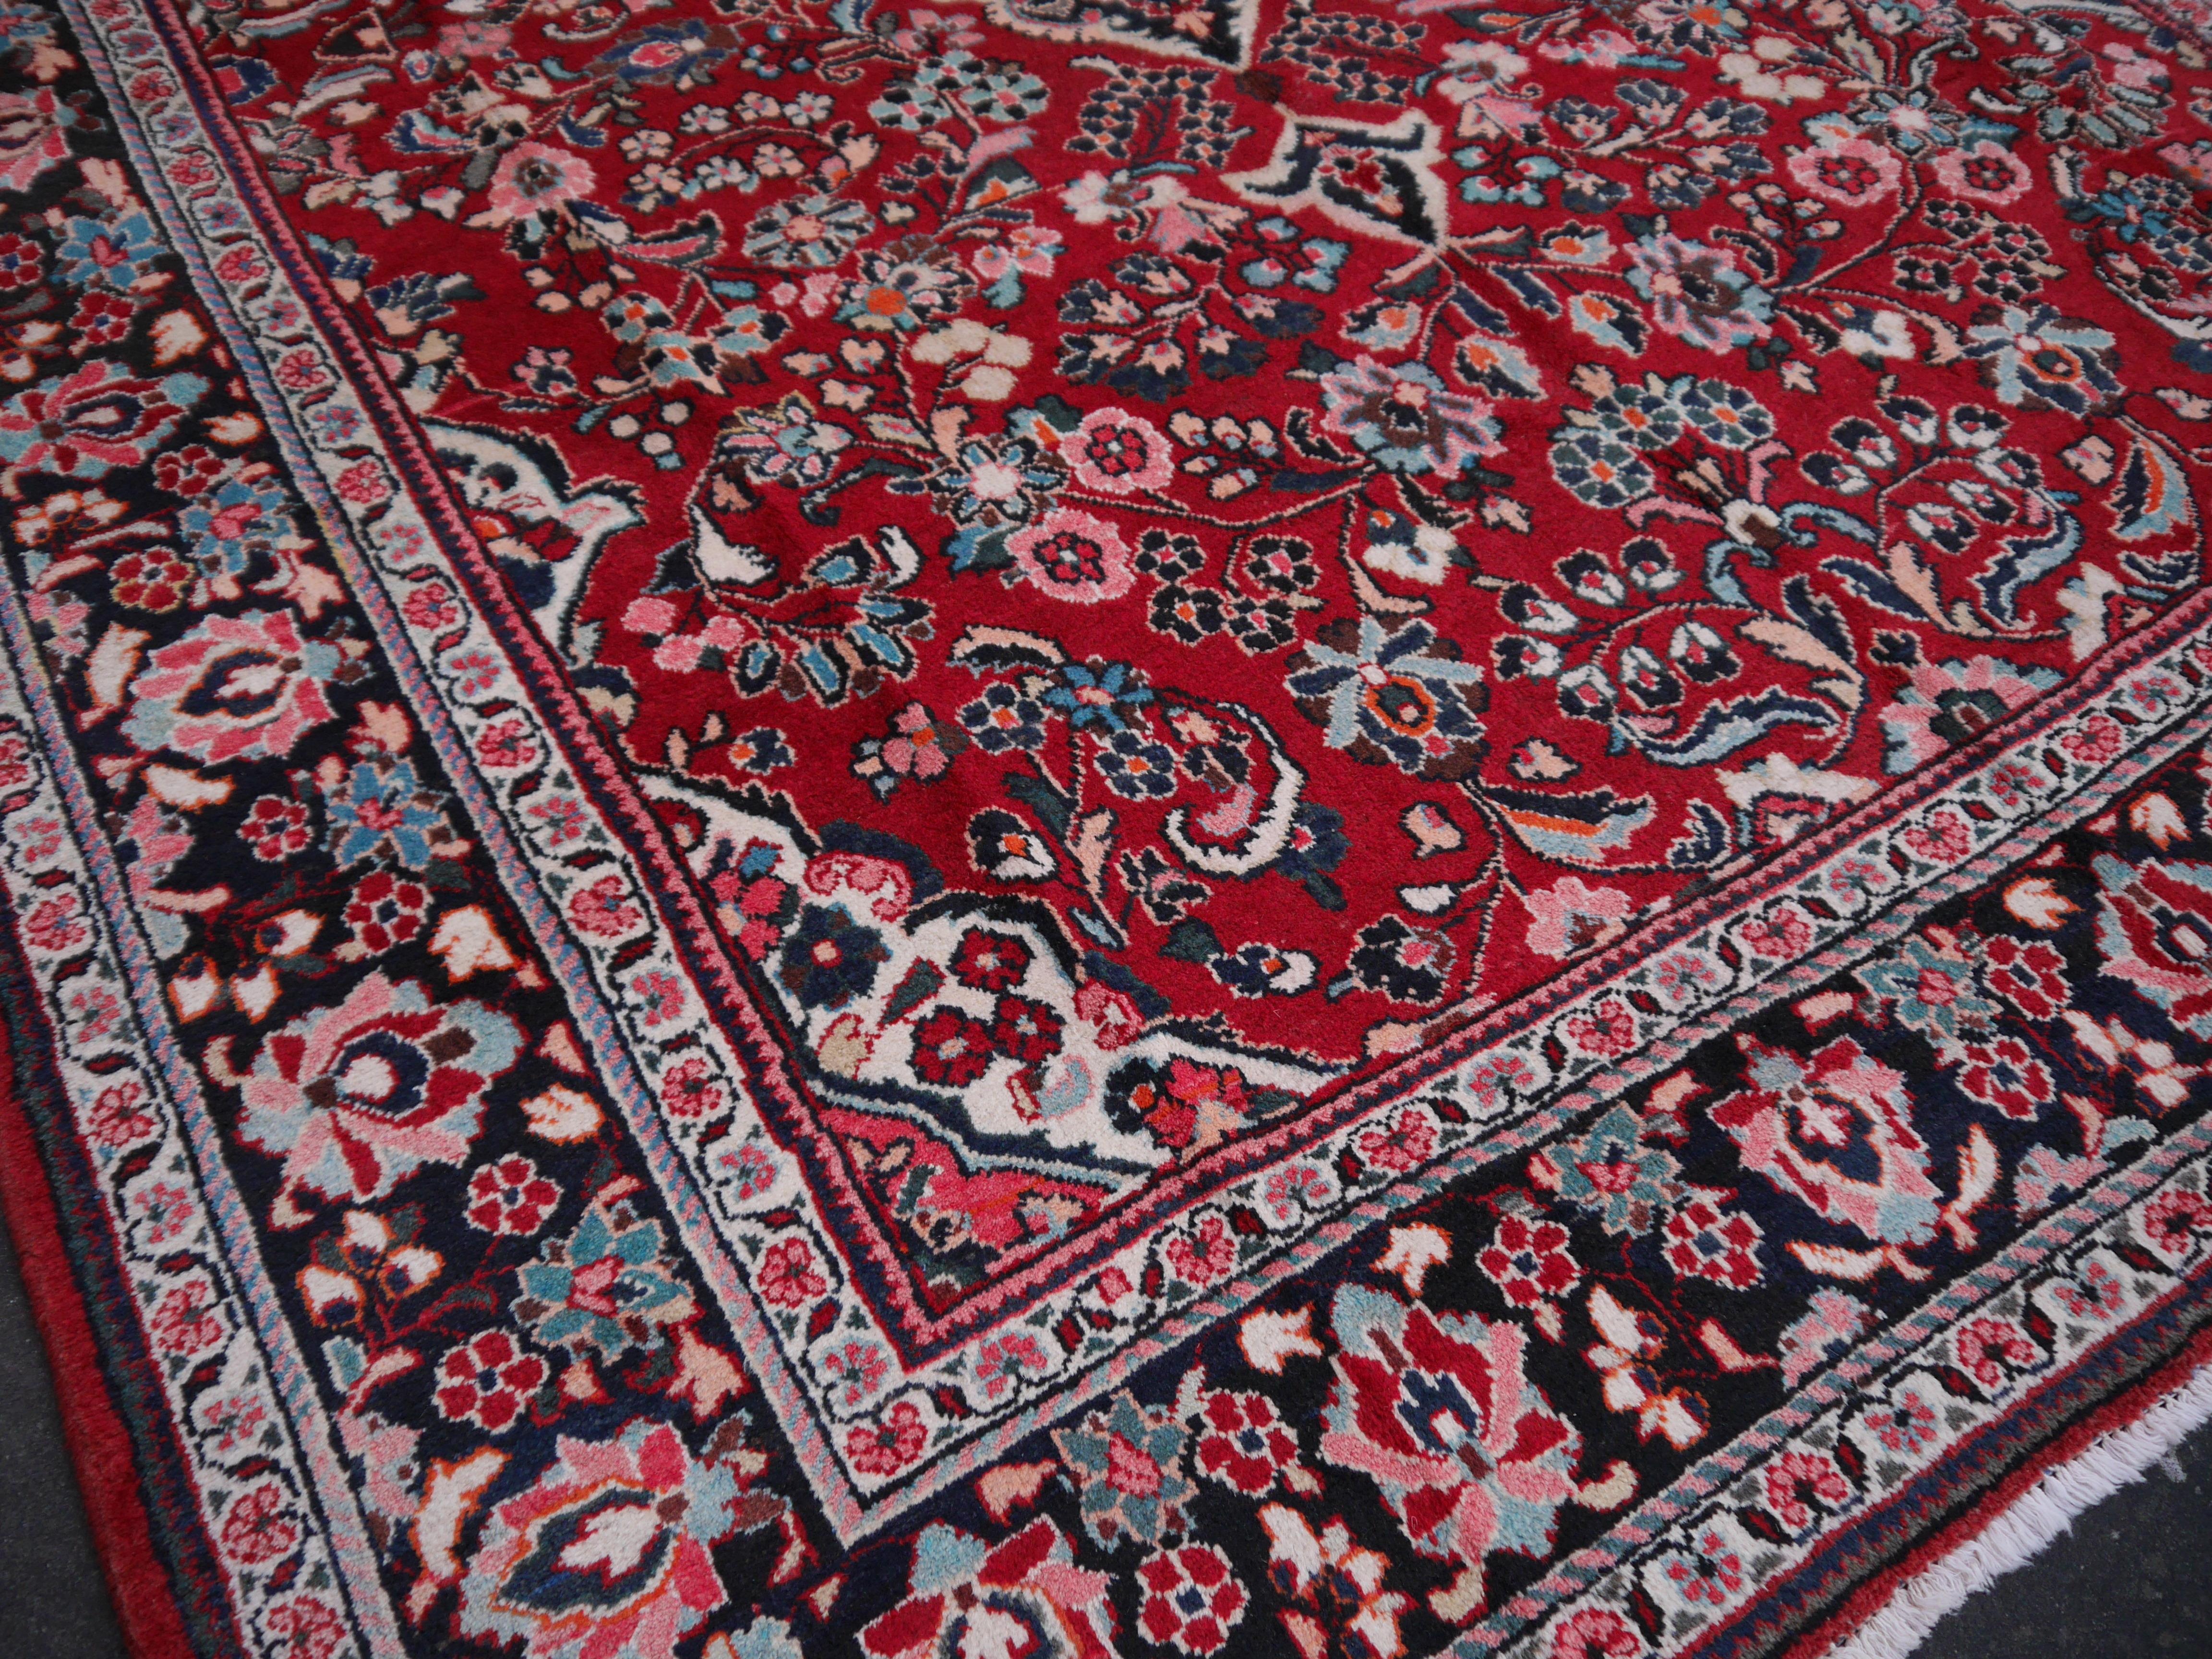 13569 Sarouk 12 7 X 9 Ft 386 X 274 Cm Vintage Persian Rug